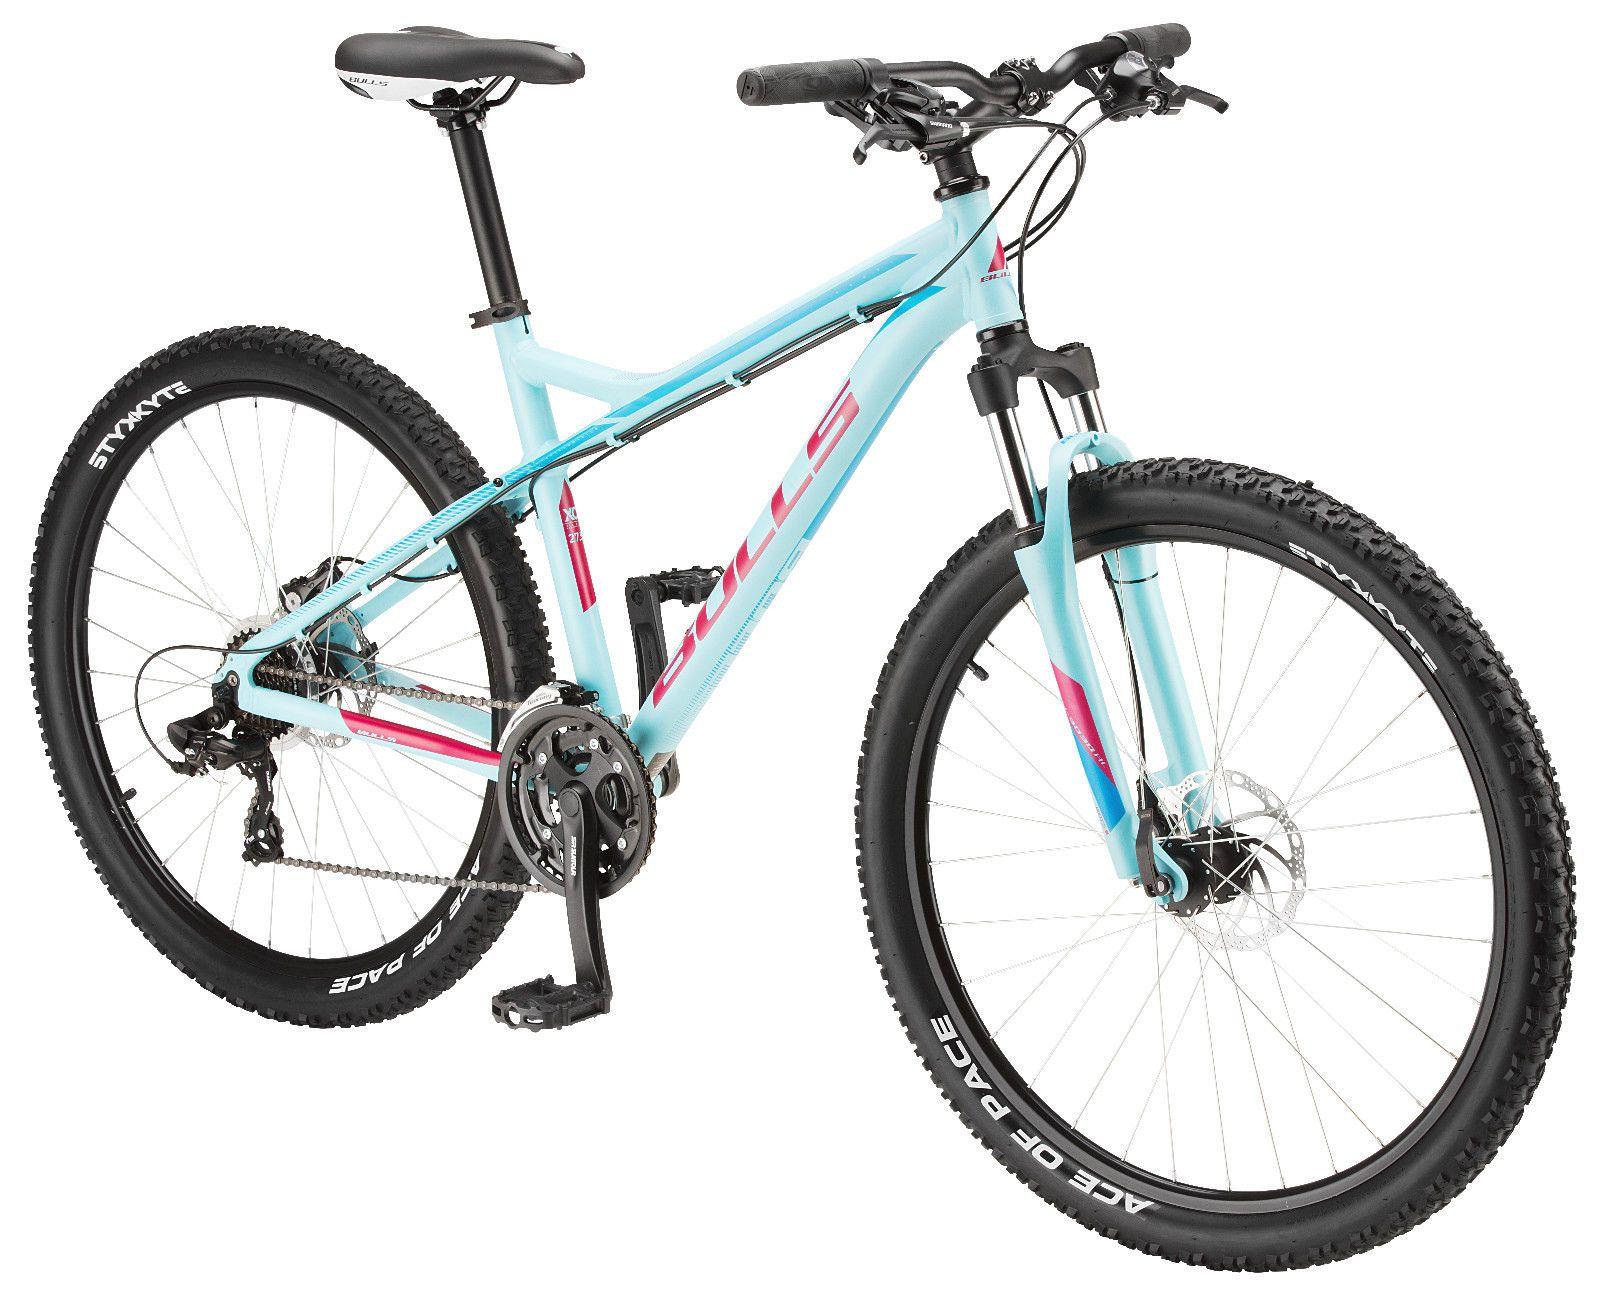 Ebay Angebot Bulls Nandi Disc Shimano 275 Zoll Mountainbike 41 Cm